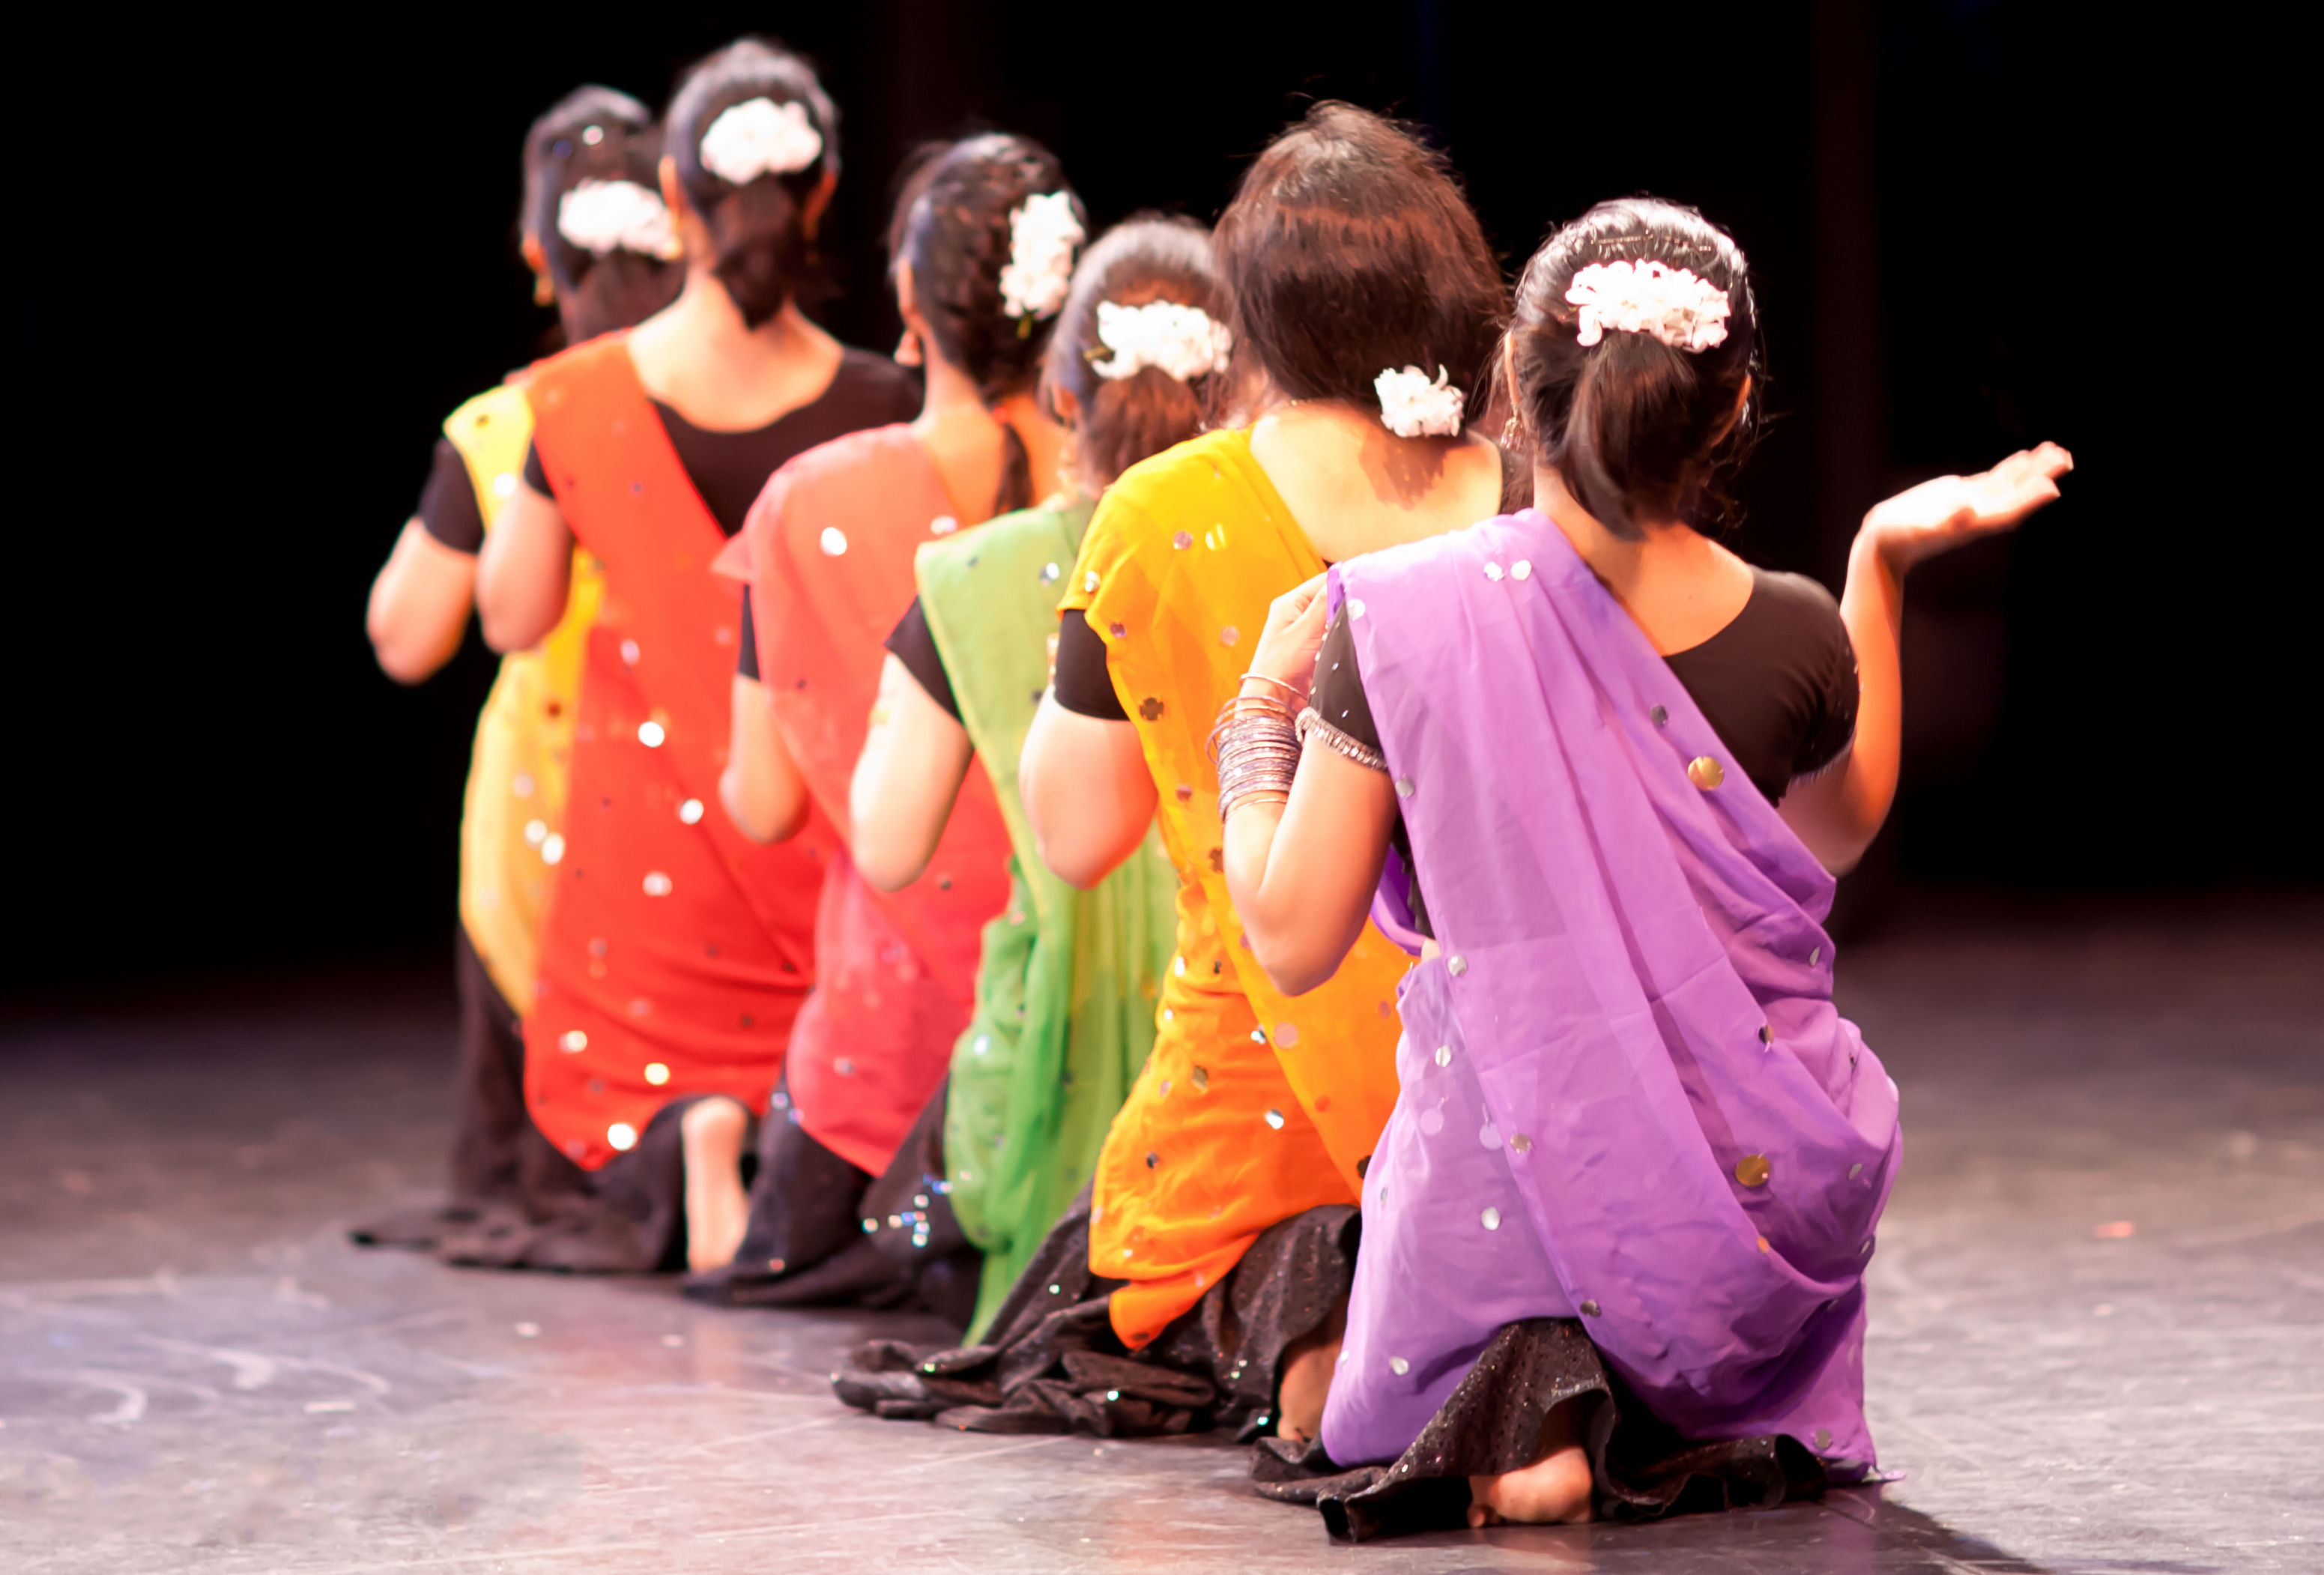 https://upload.wikimedia.org/wikipedia/commons/7/75/South_Indian_Film_Dance.jpg